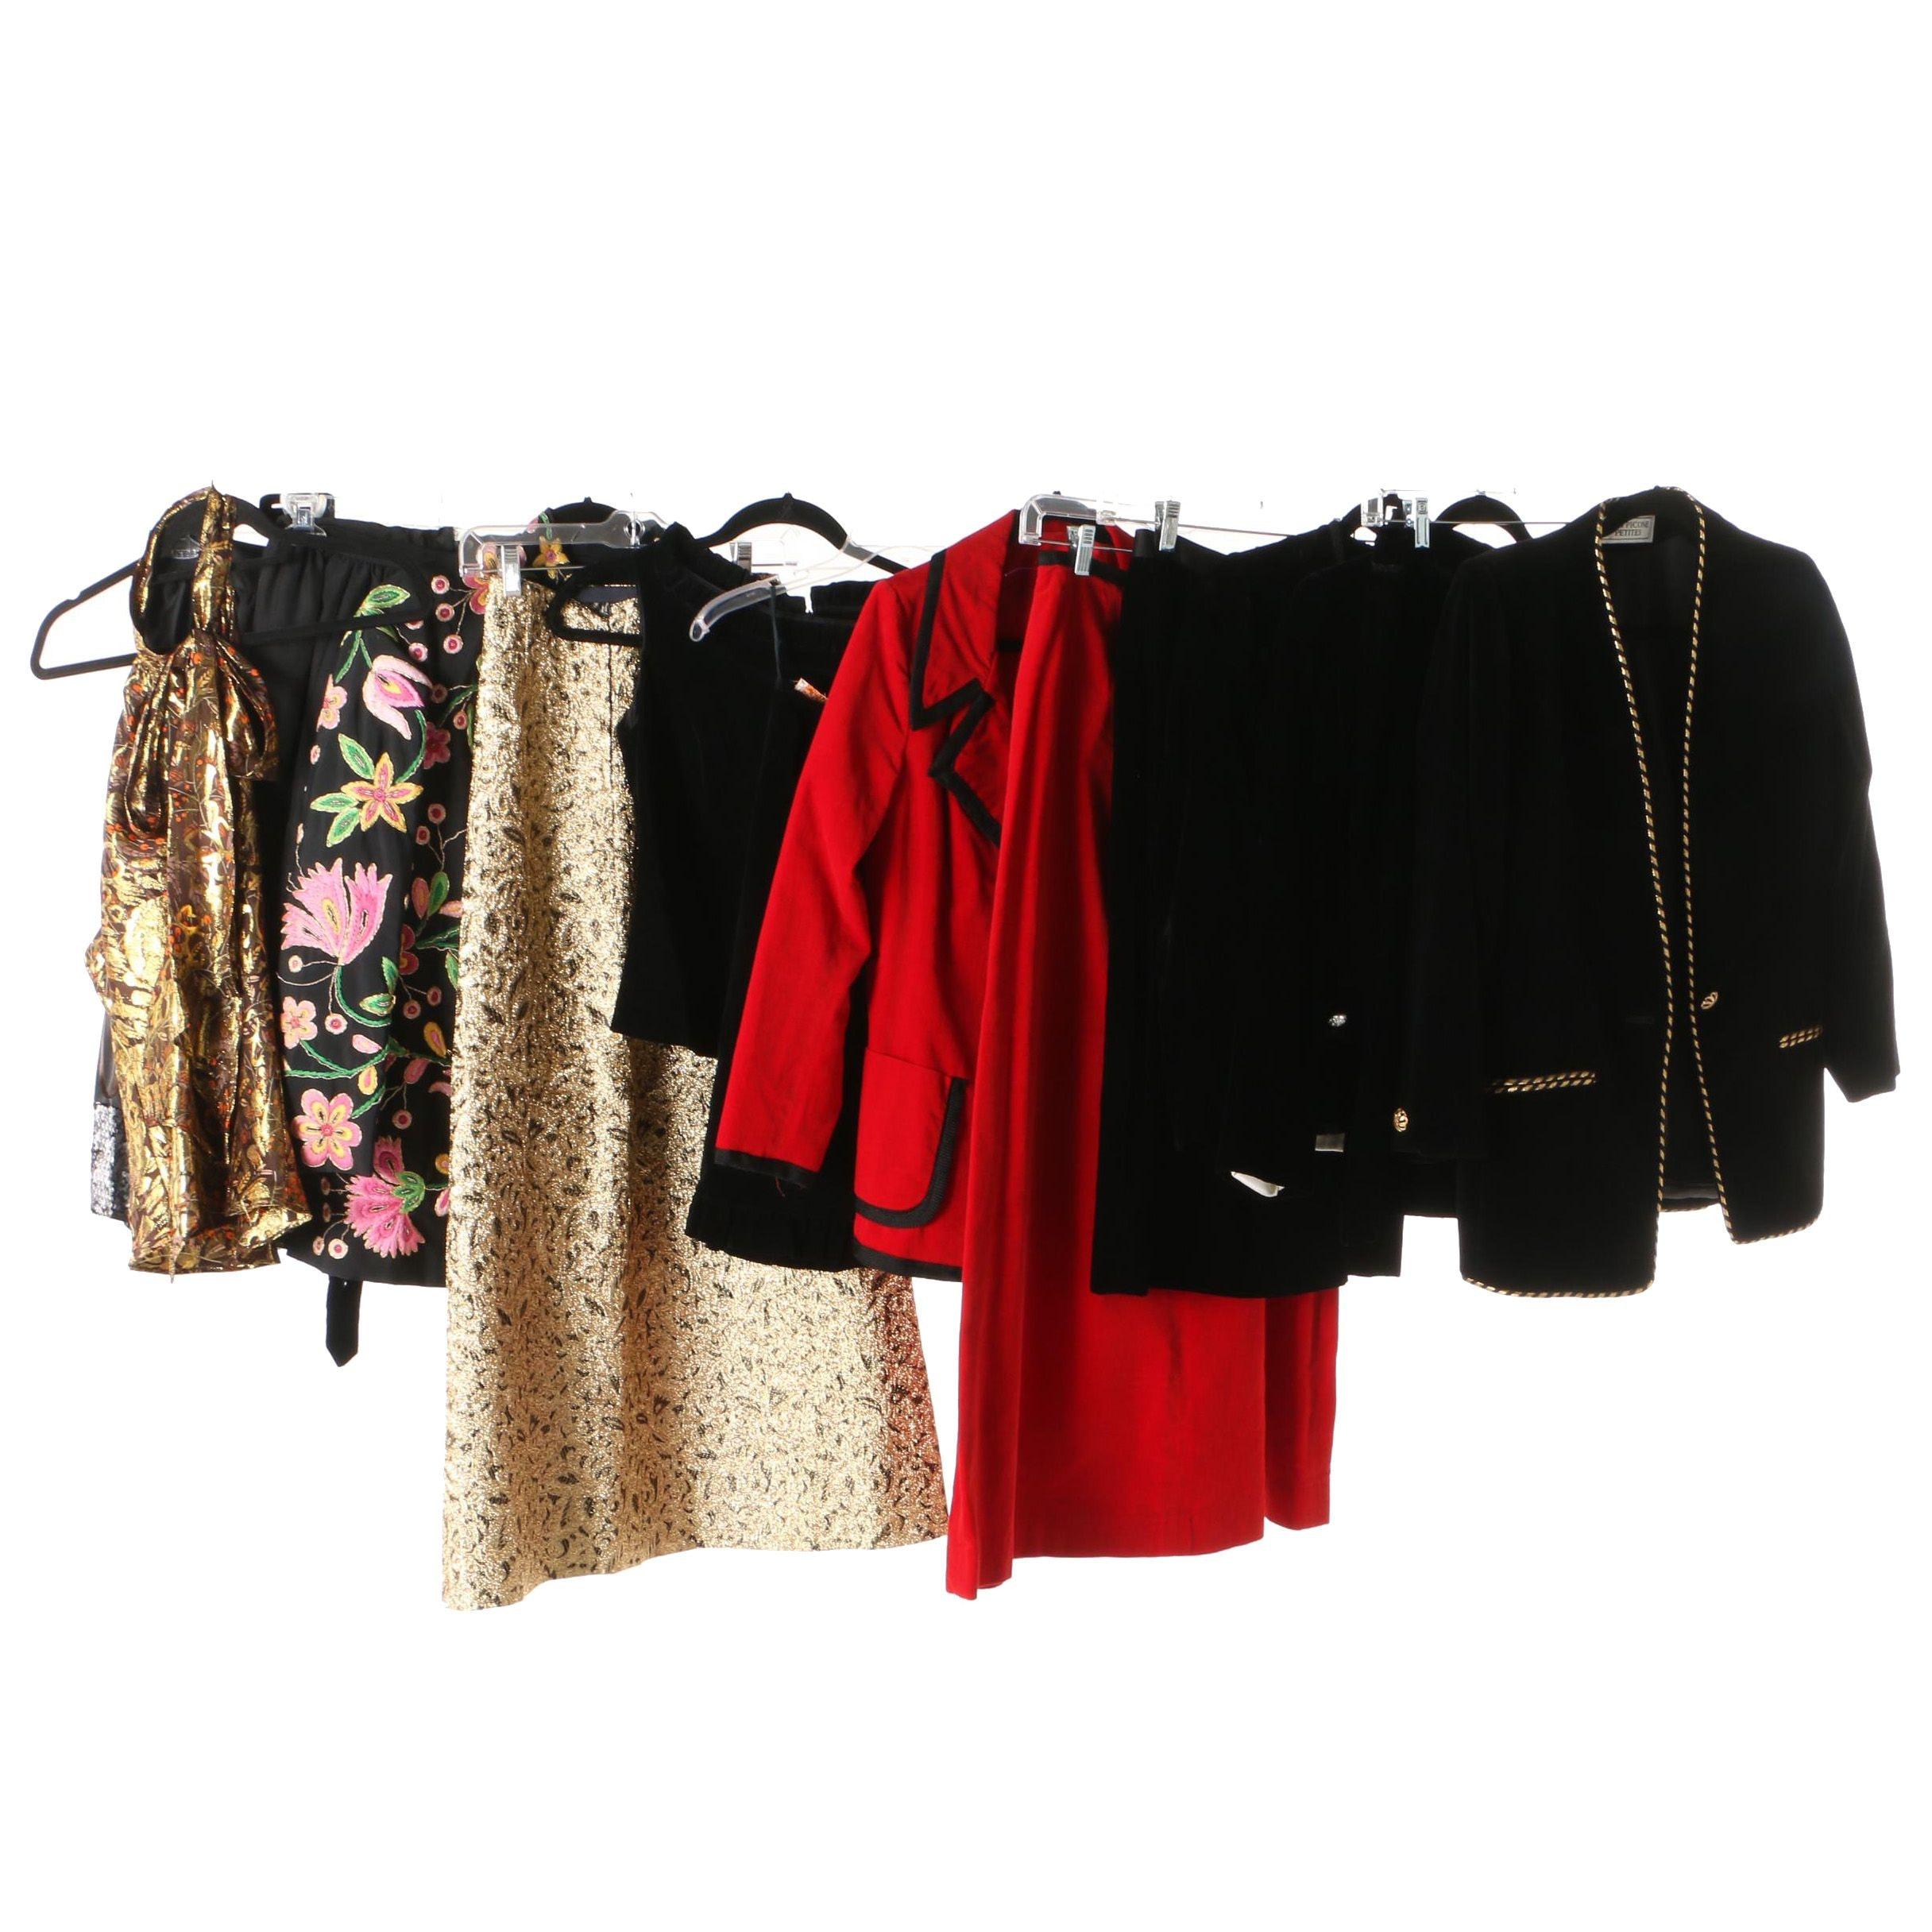 Designer Fashion & Accessories